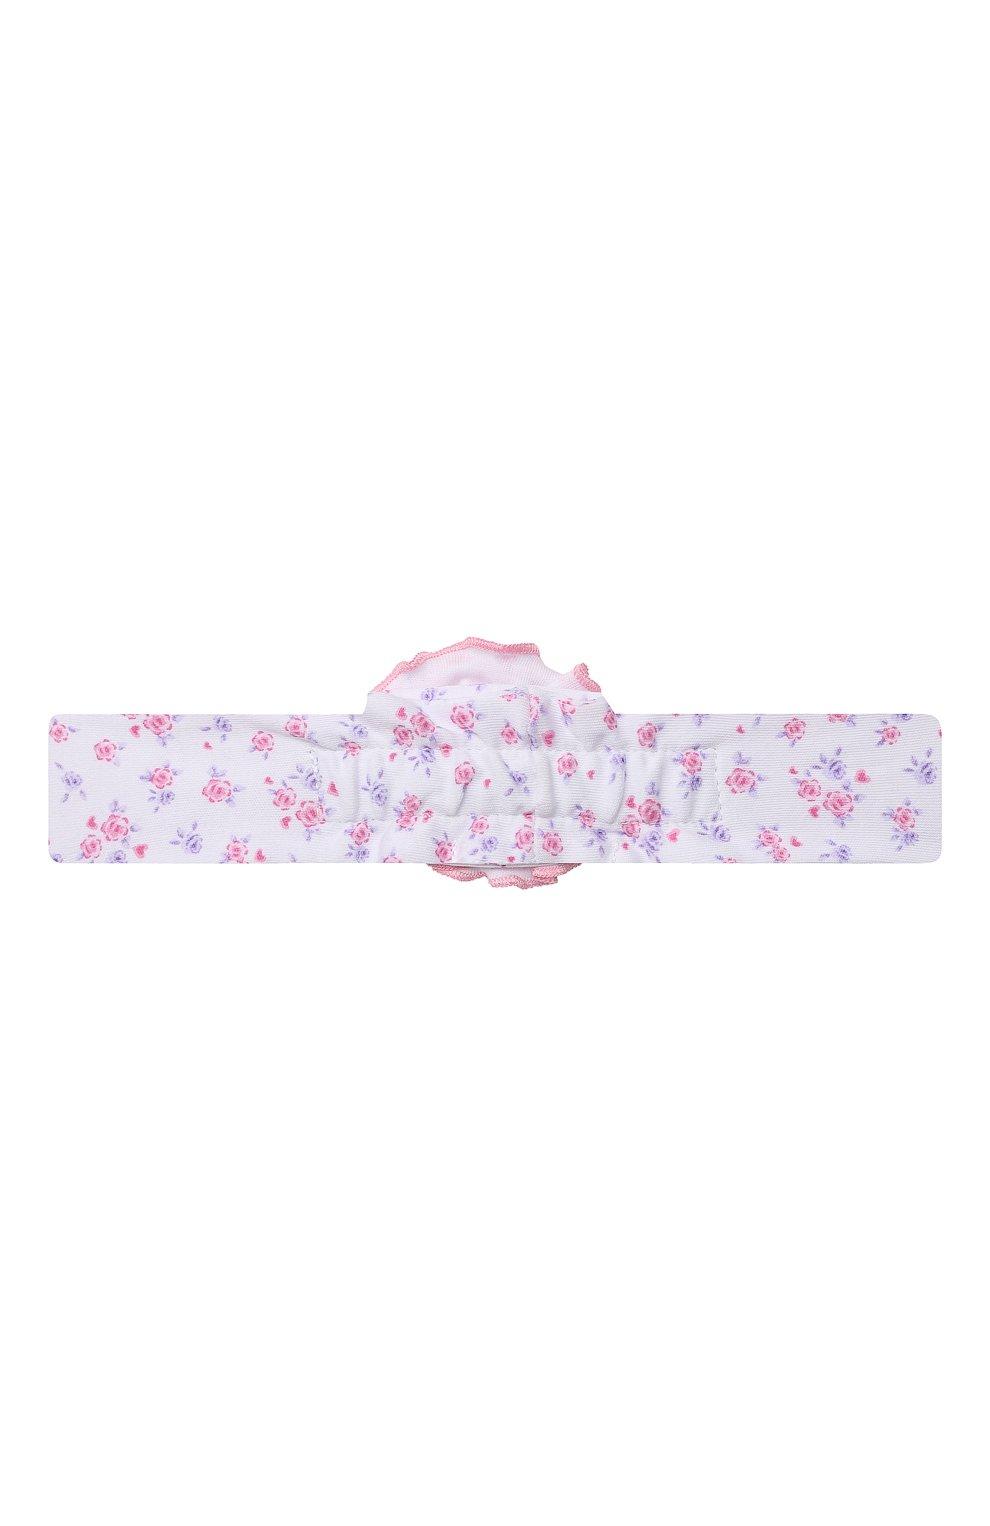 Детская повязка KISSY KISSY розового цвета, арт. KG5059190 | Фото 2 (Материал: Текстиль, Хлопок)